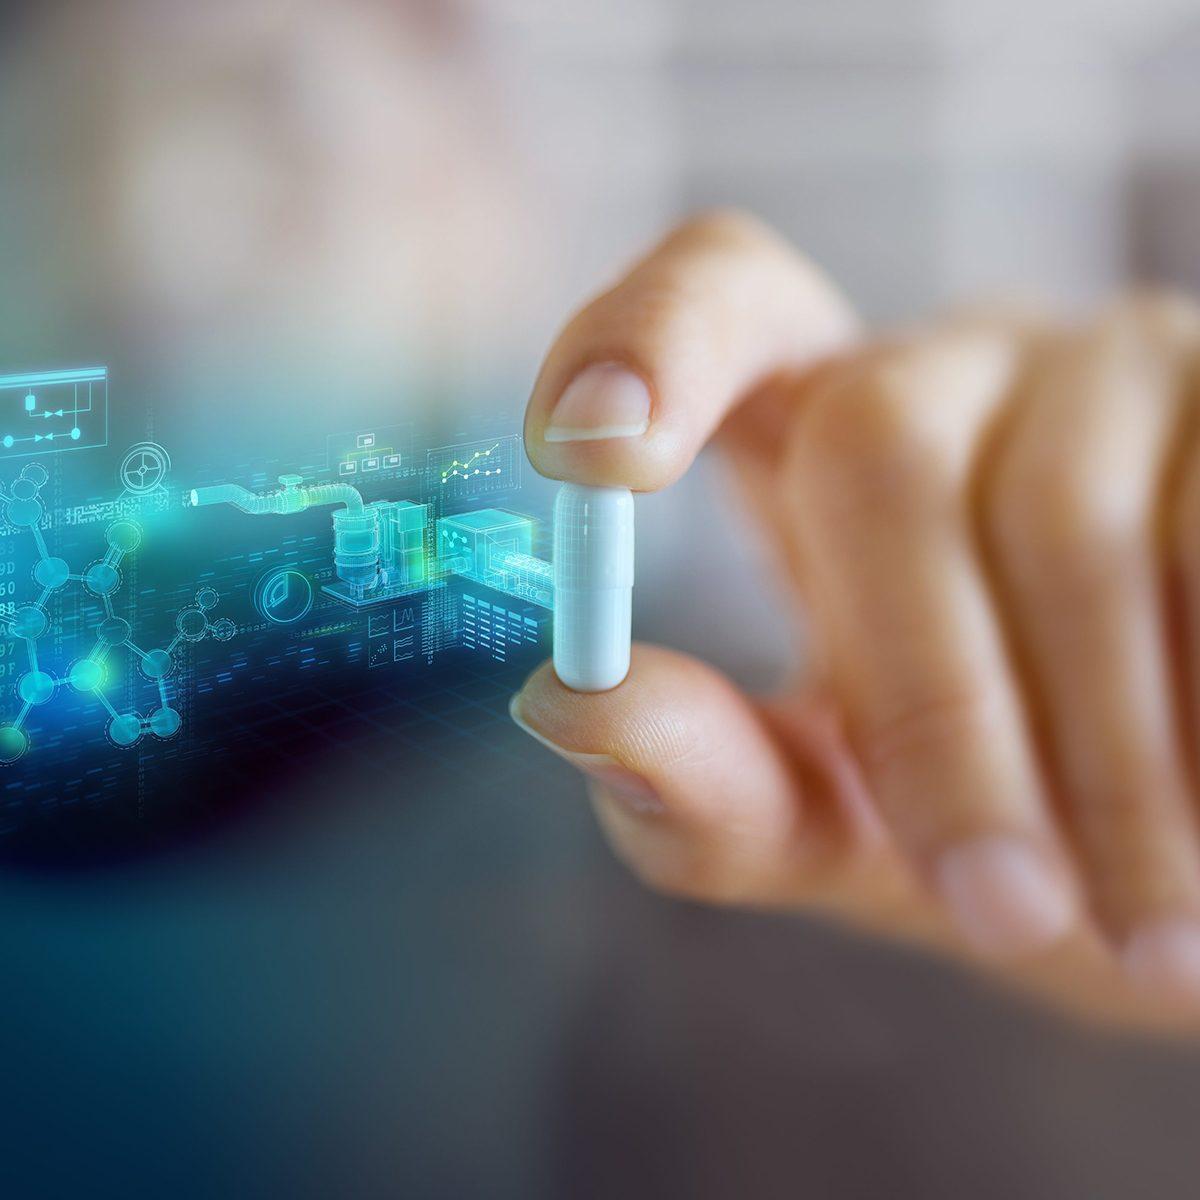 pharma-entry-social-media-teaser-1200x1200px